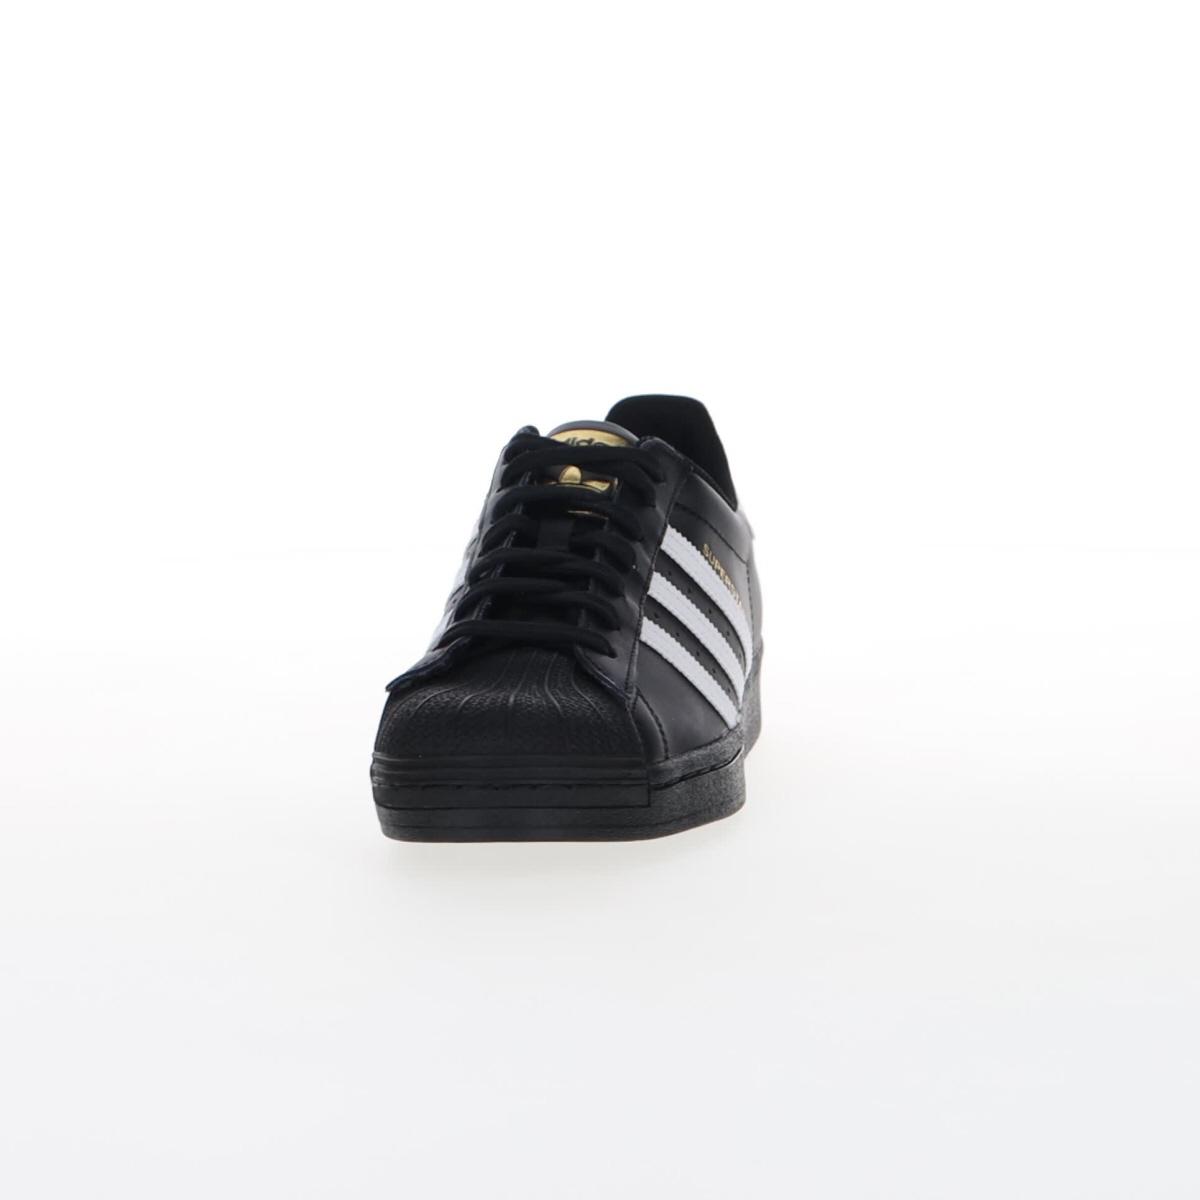 nike lunar sport shoes for women black boots